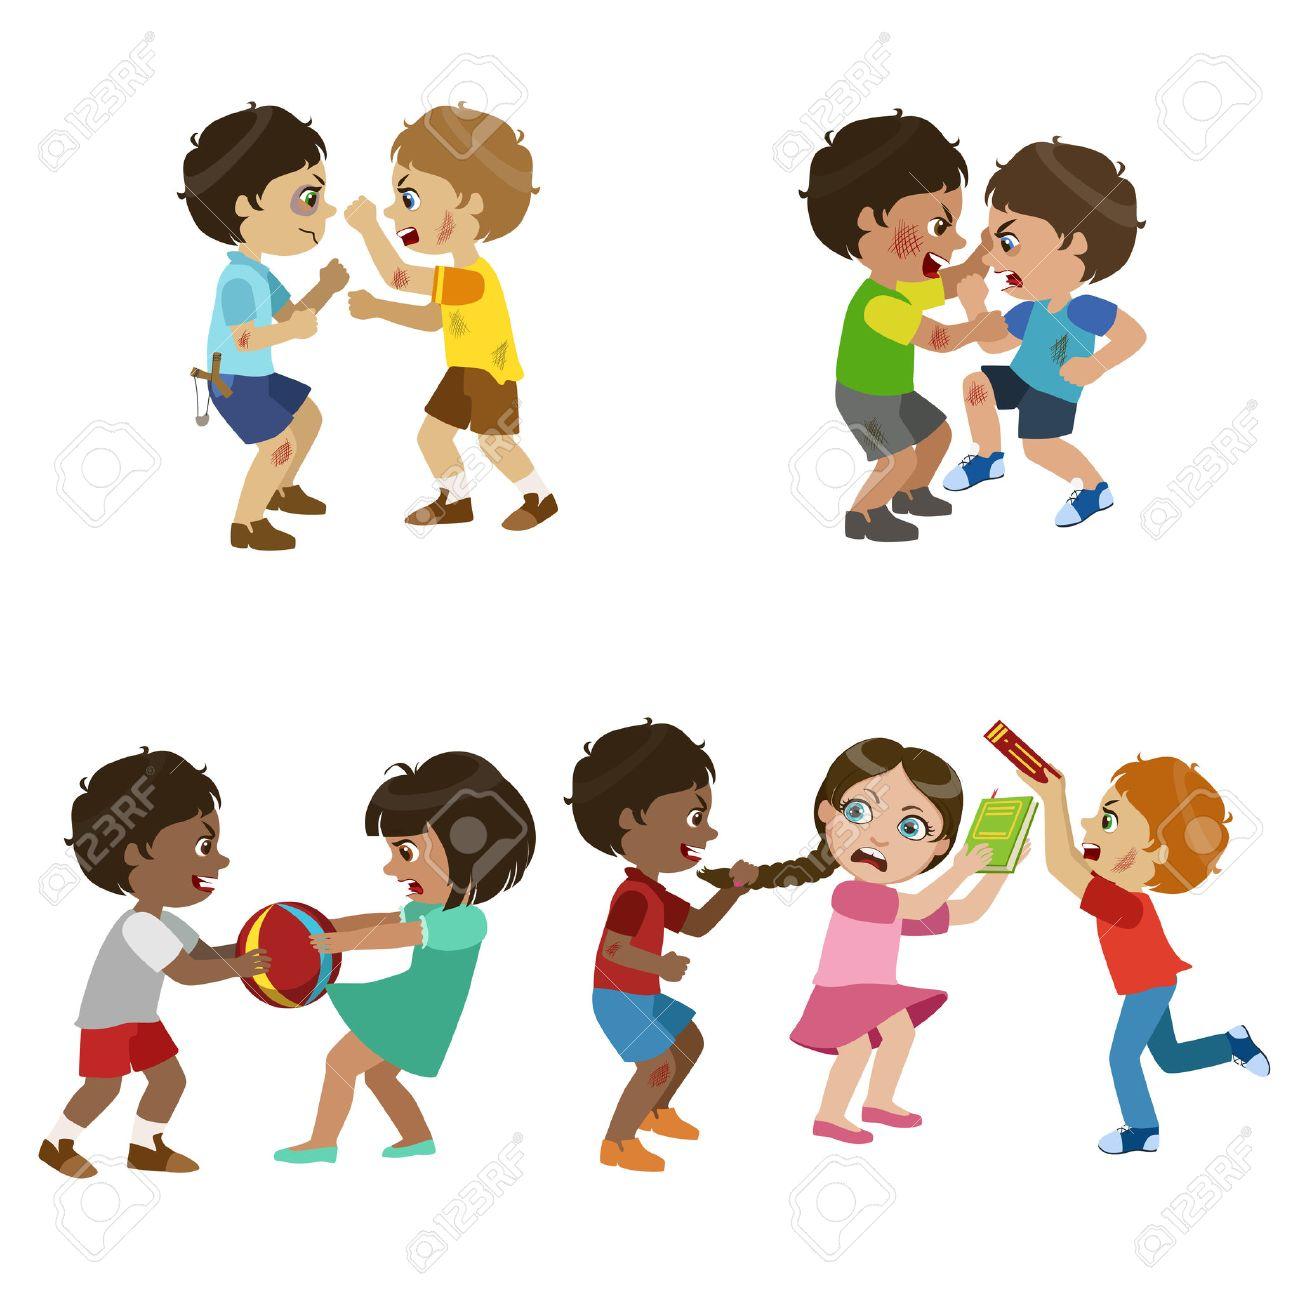 Kids Bullies Childish Cartoon Style Cute Vector Illustration On White Background - 57889849